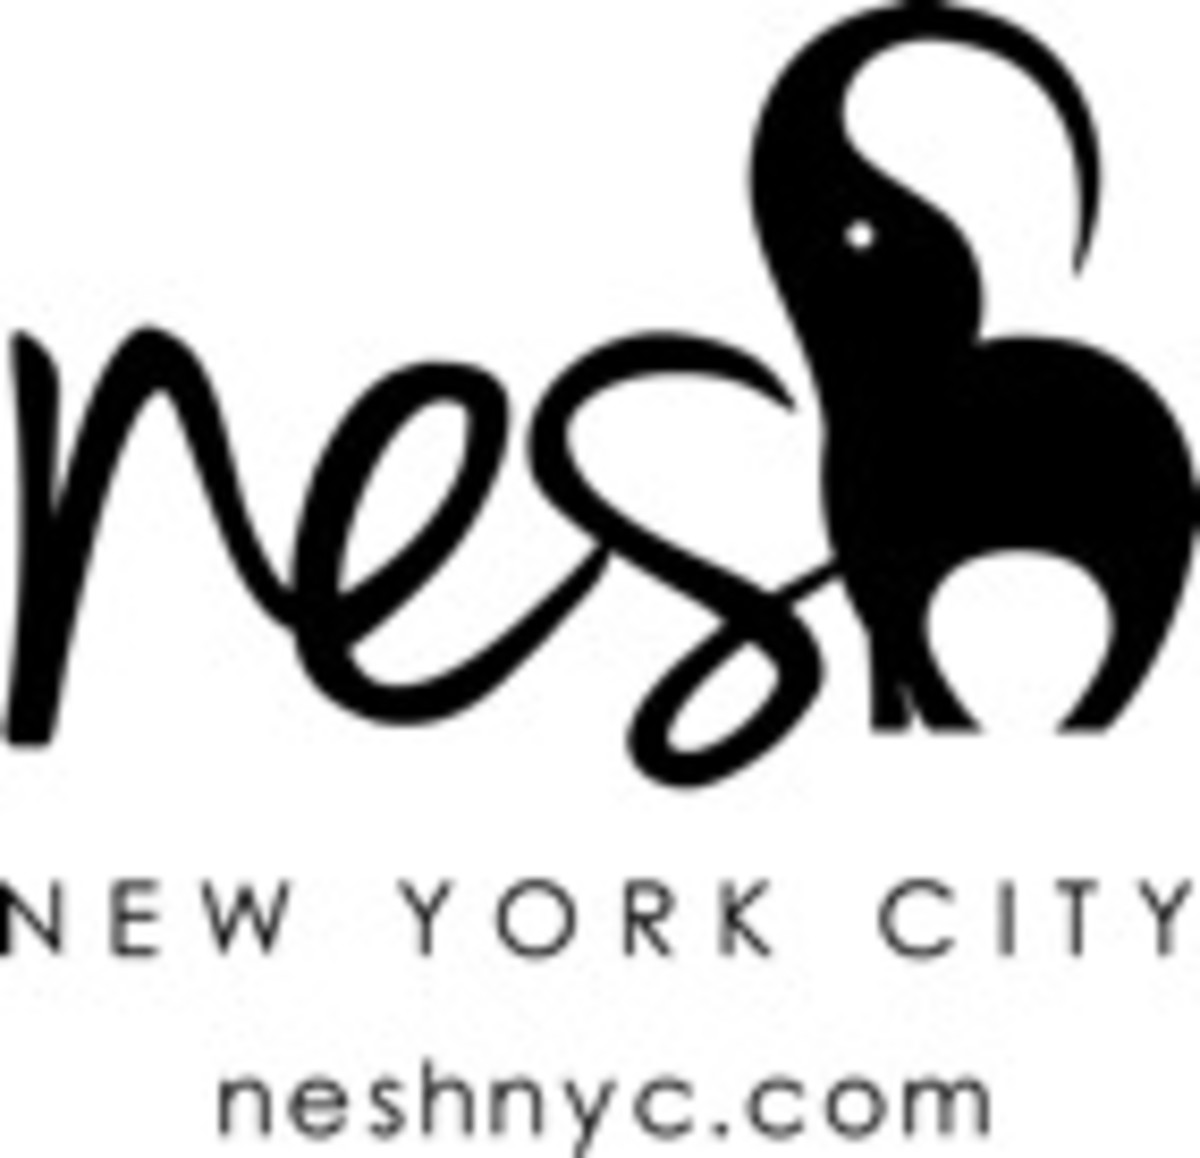 NESH NYC LOGO - black on transparent.jpeg